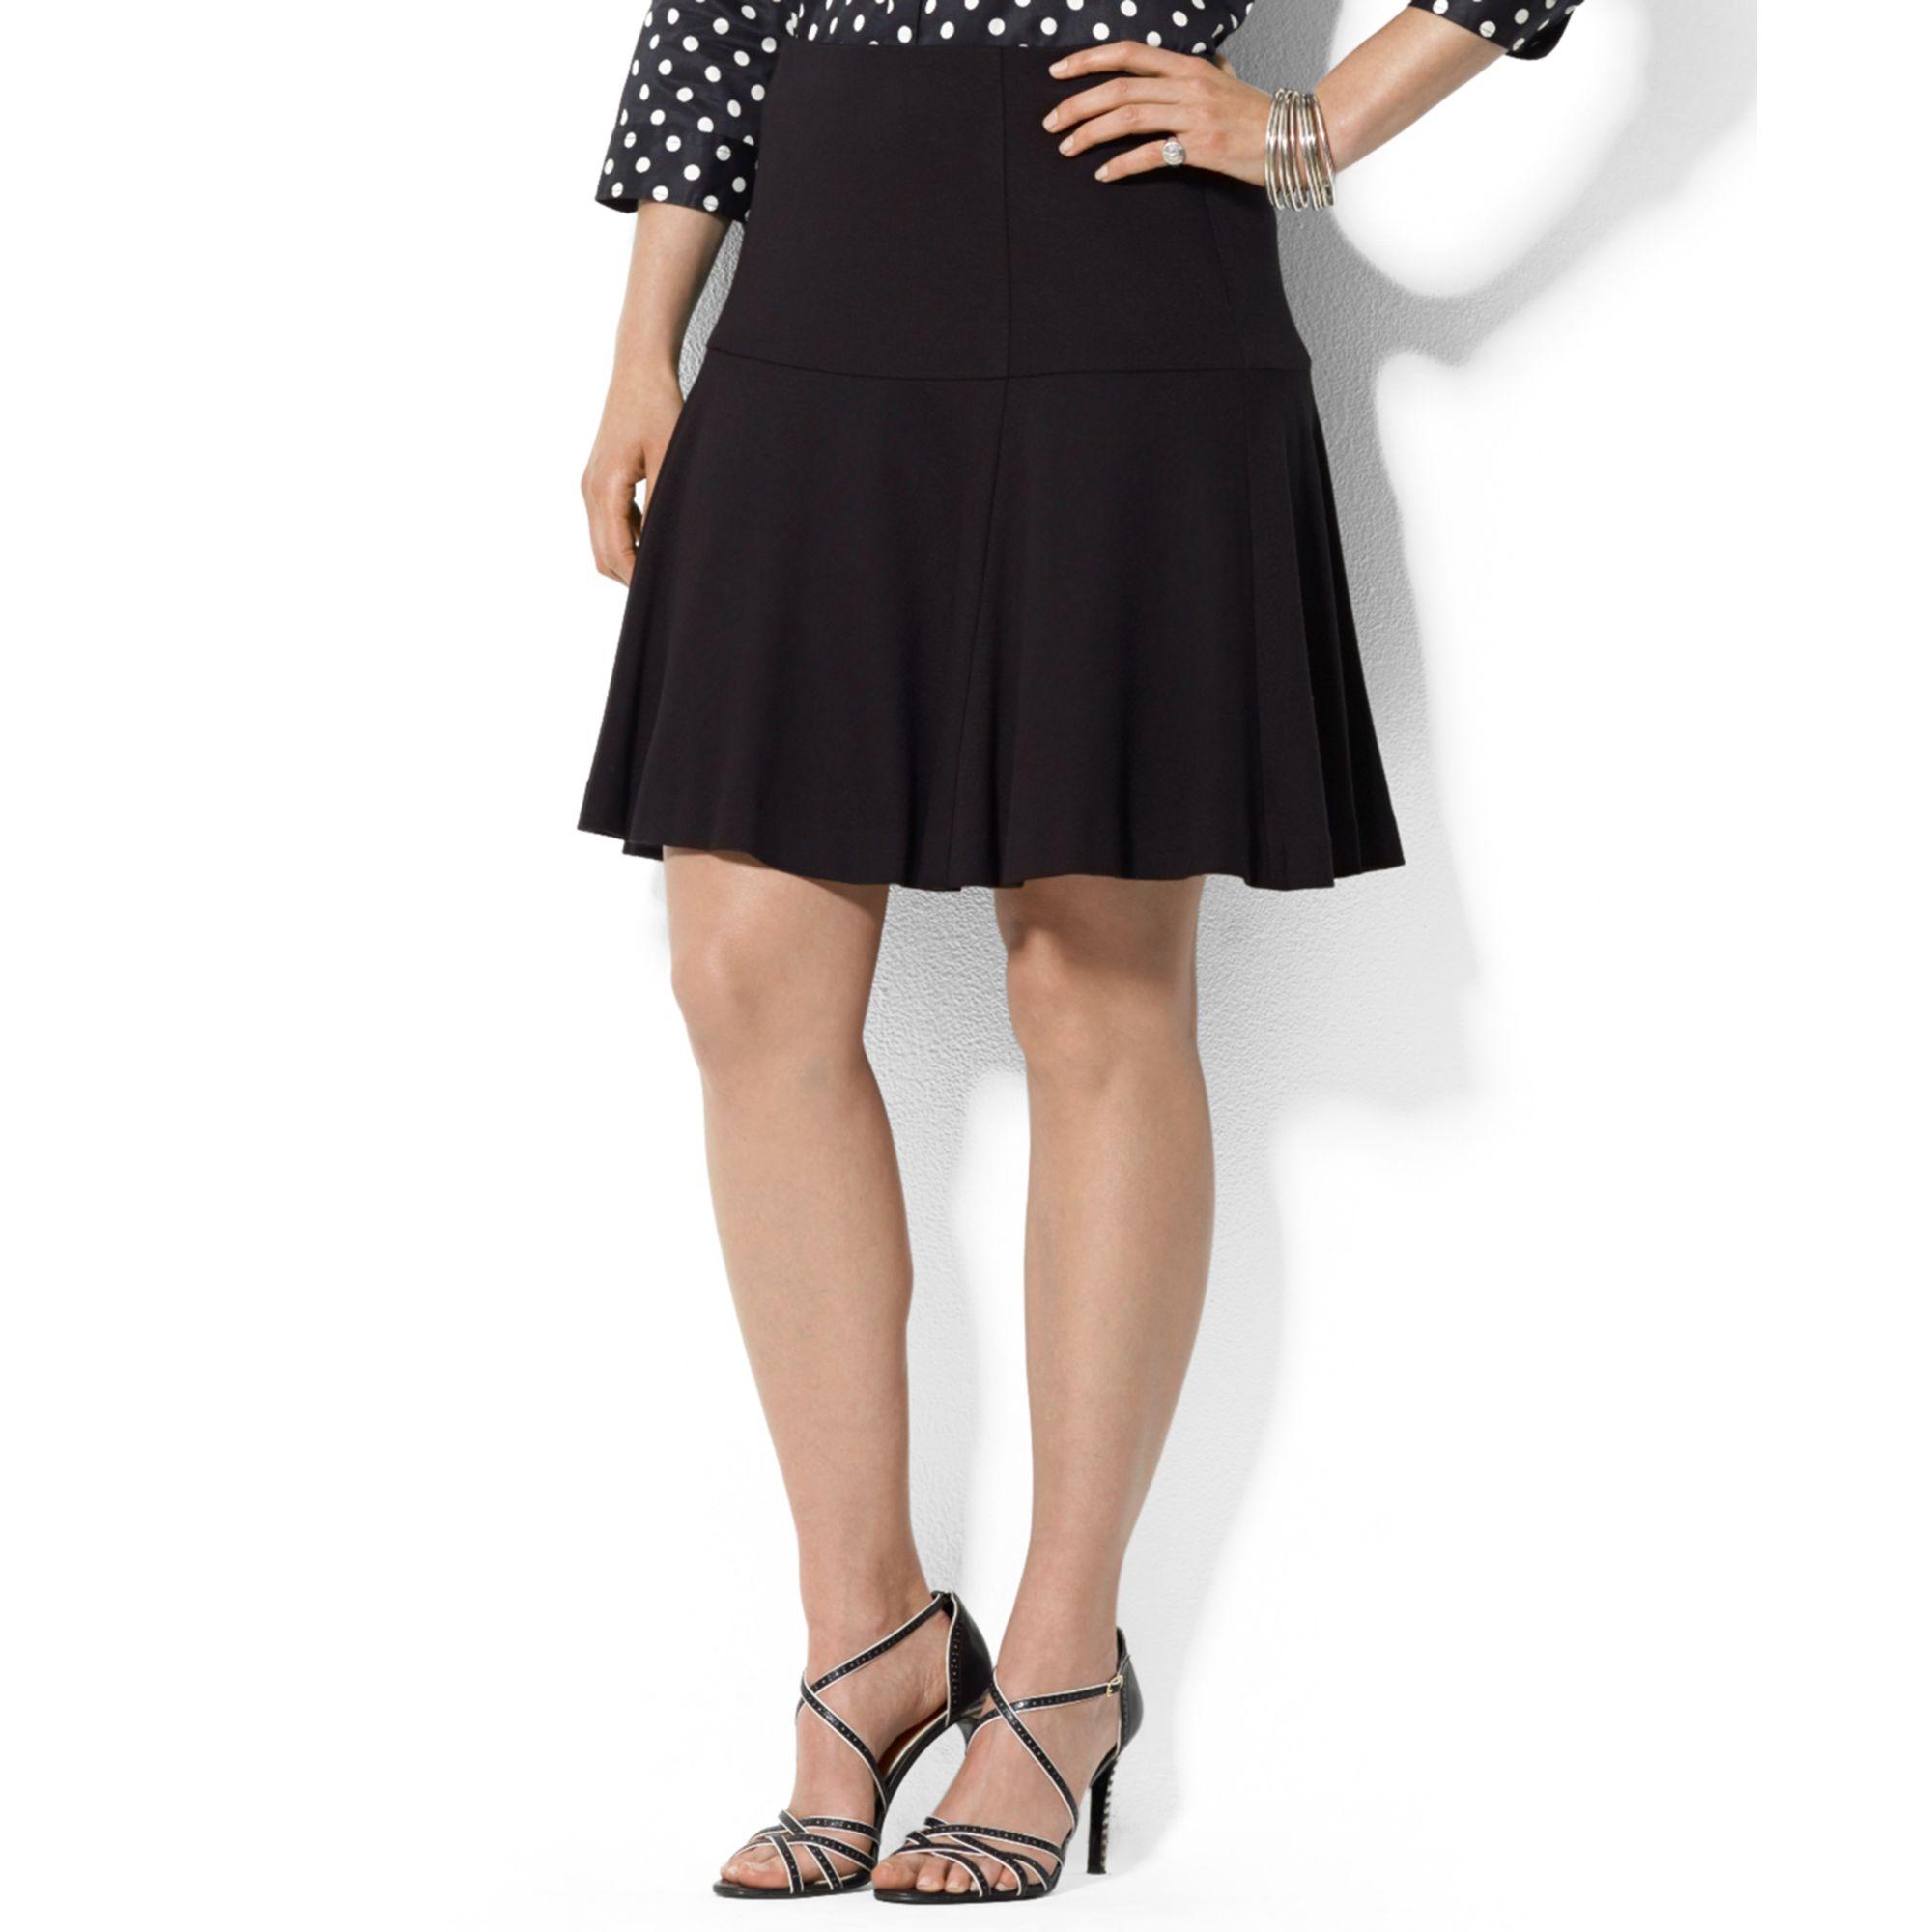 ee605819f74db Lyst - Lauren by Ralph Lauren Plus Size Fitandflare Skirt in Black